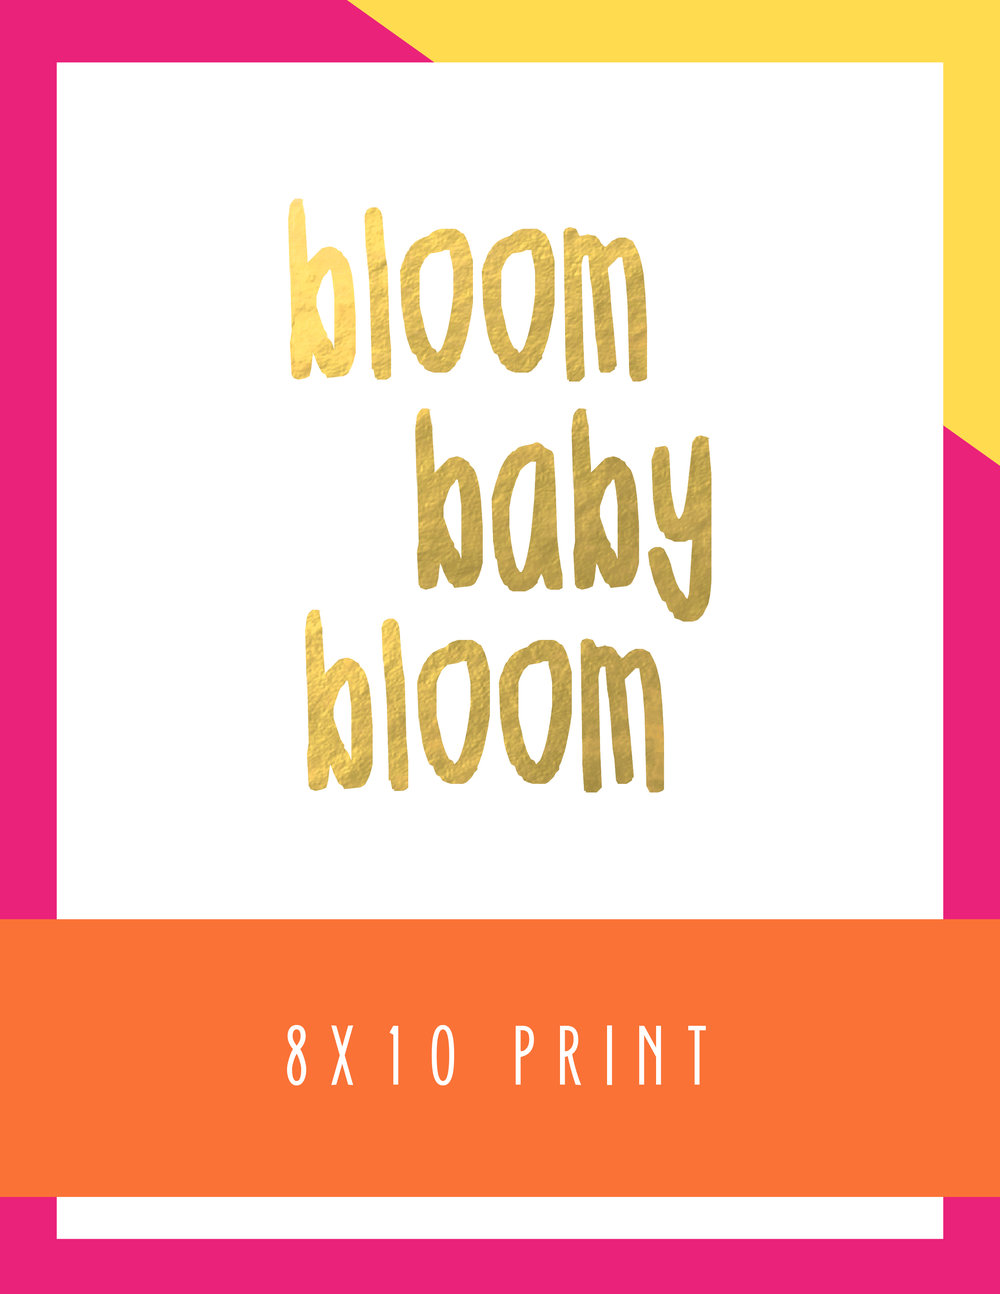 Bold&Pop_Bloom_Baby_Bloom_8x10_Print